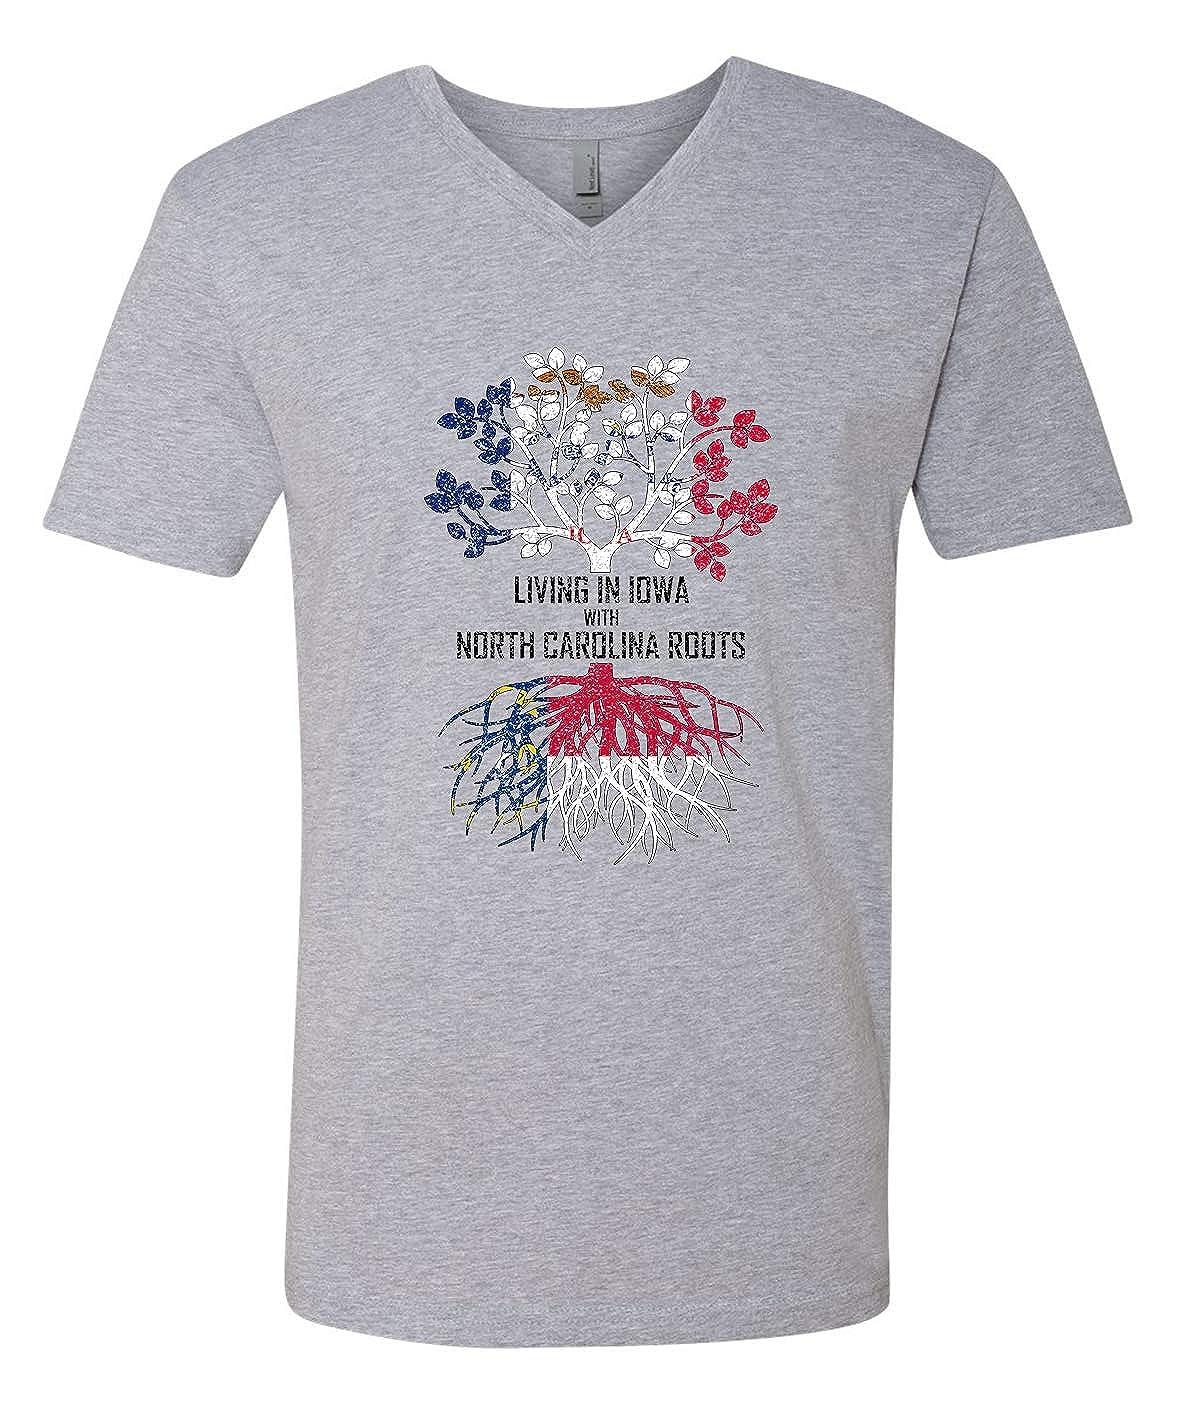 Tenacitee Mens Living in Iowa North Carolina Roots T-Shirt